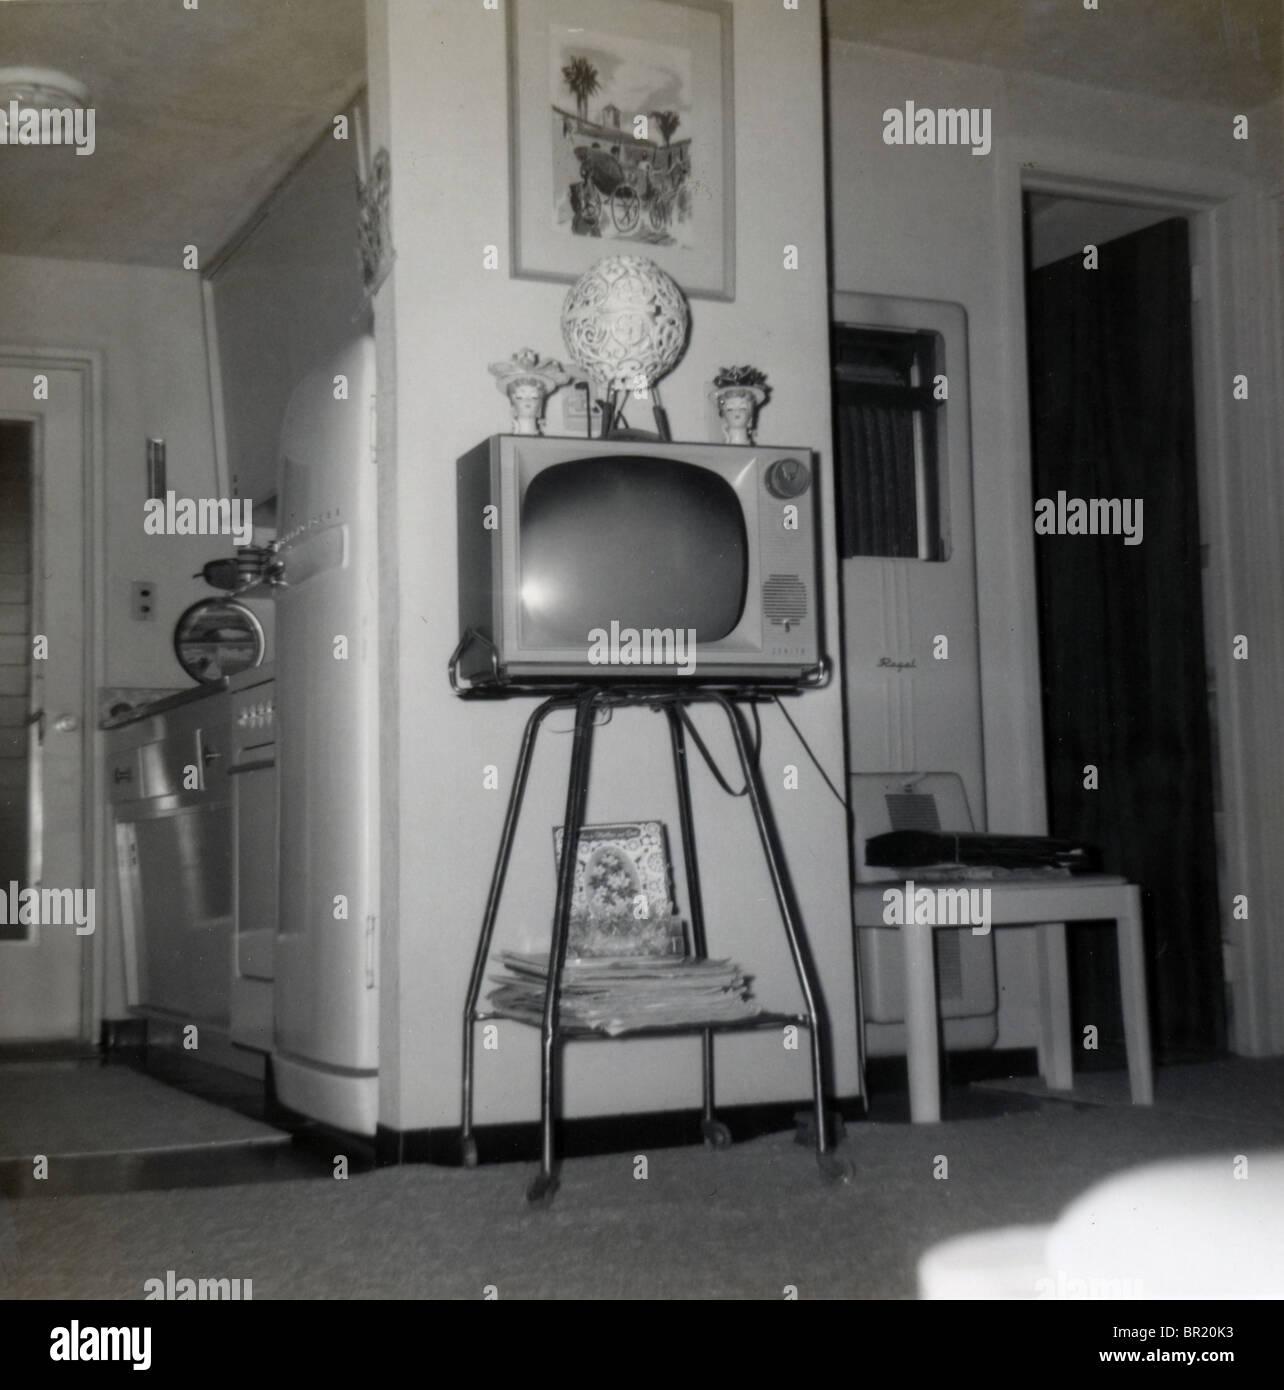 Retro mod circa 1964 living room with Zenith television, Daytona